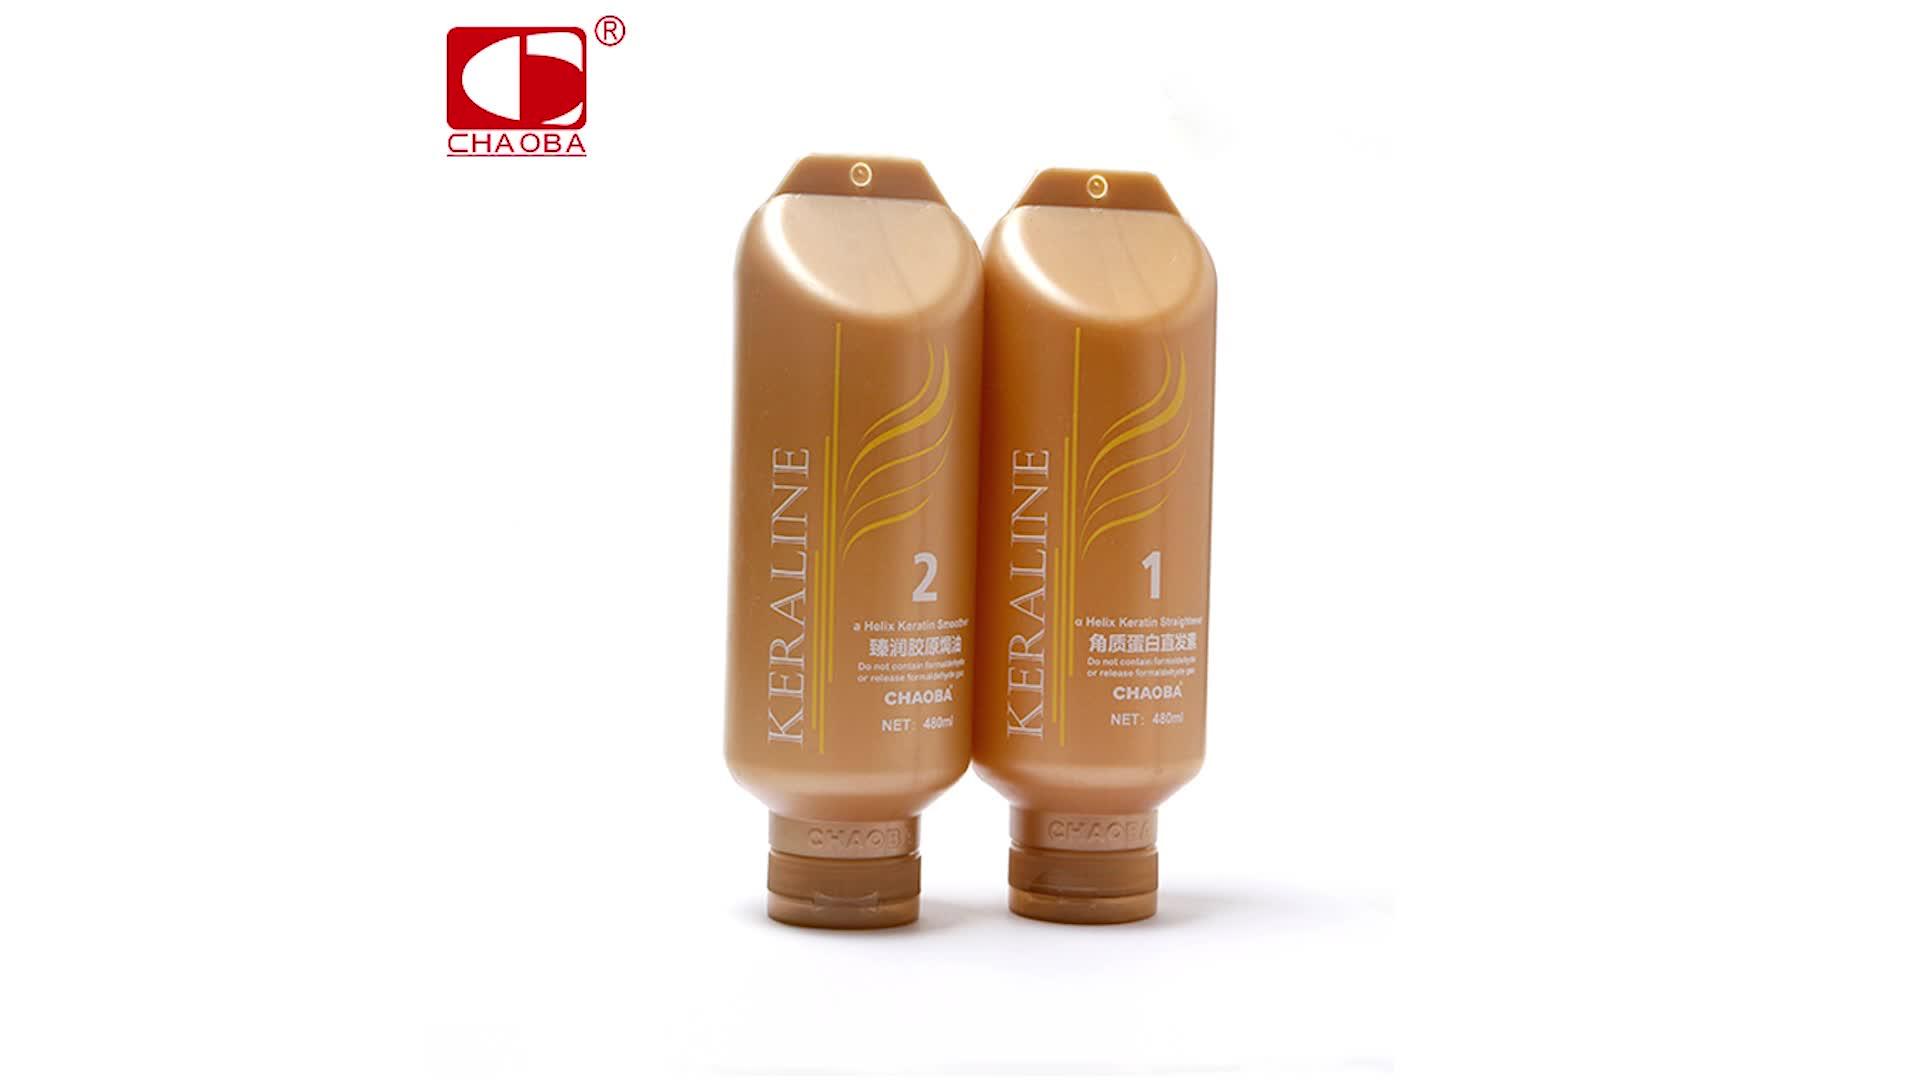 Professional Keratin Hair Smoothing Straightening Treatment Cream For Salon